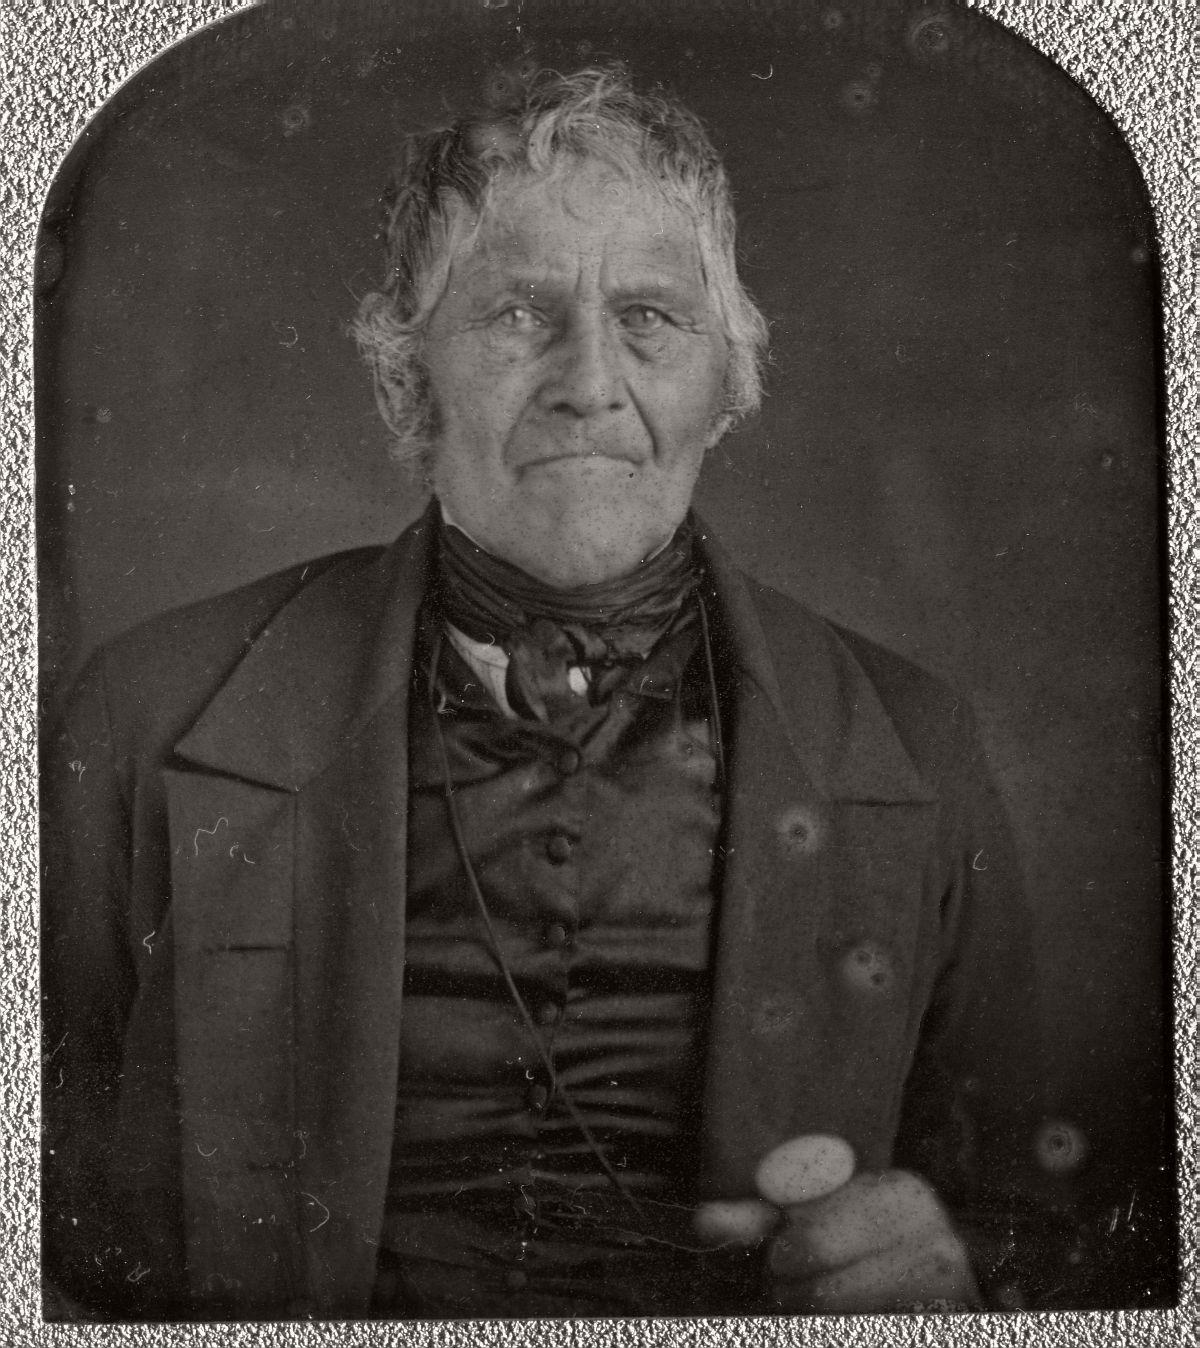 daguerreotype-portrait-people-born-in-the-late-18th-xviii-century-1700s-vintage-13